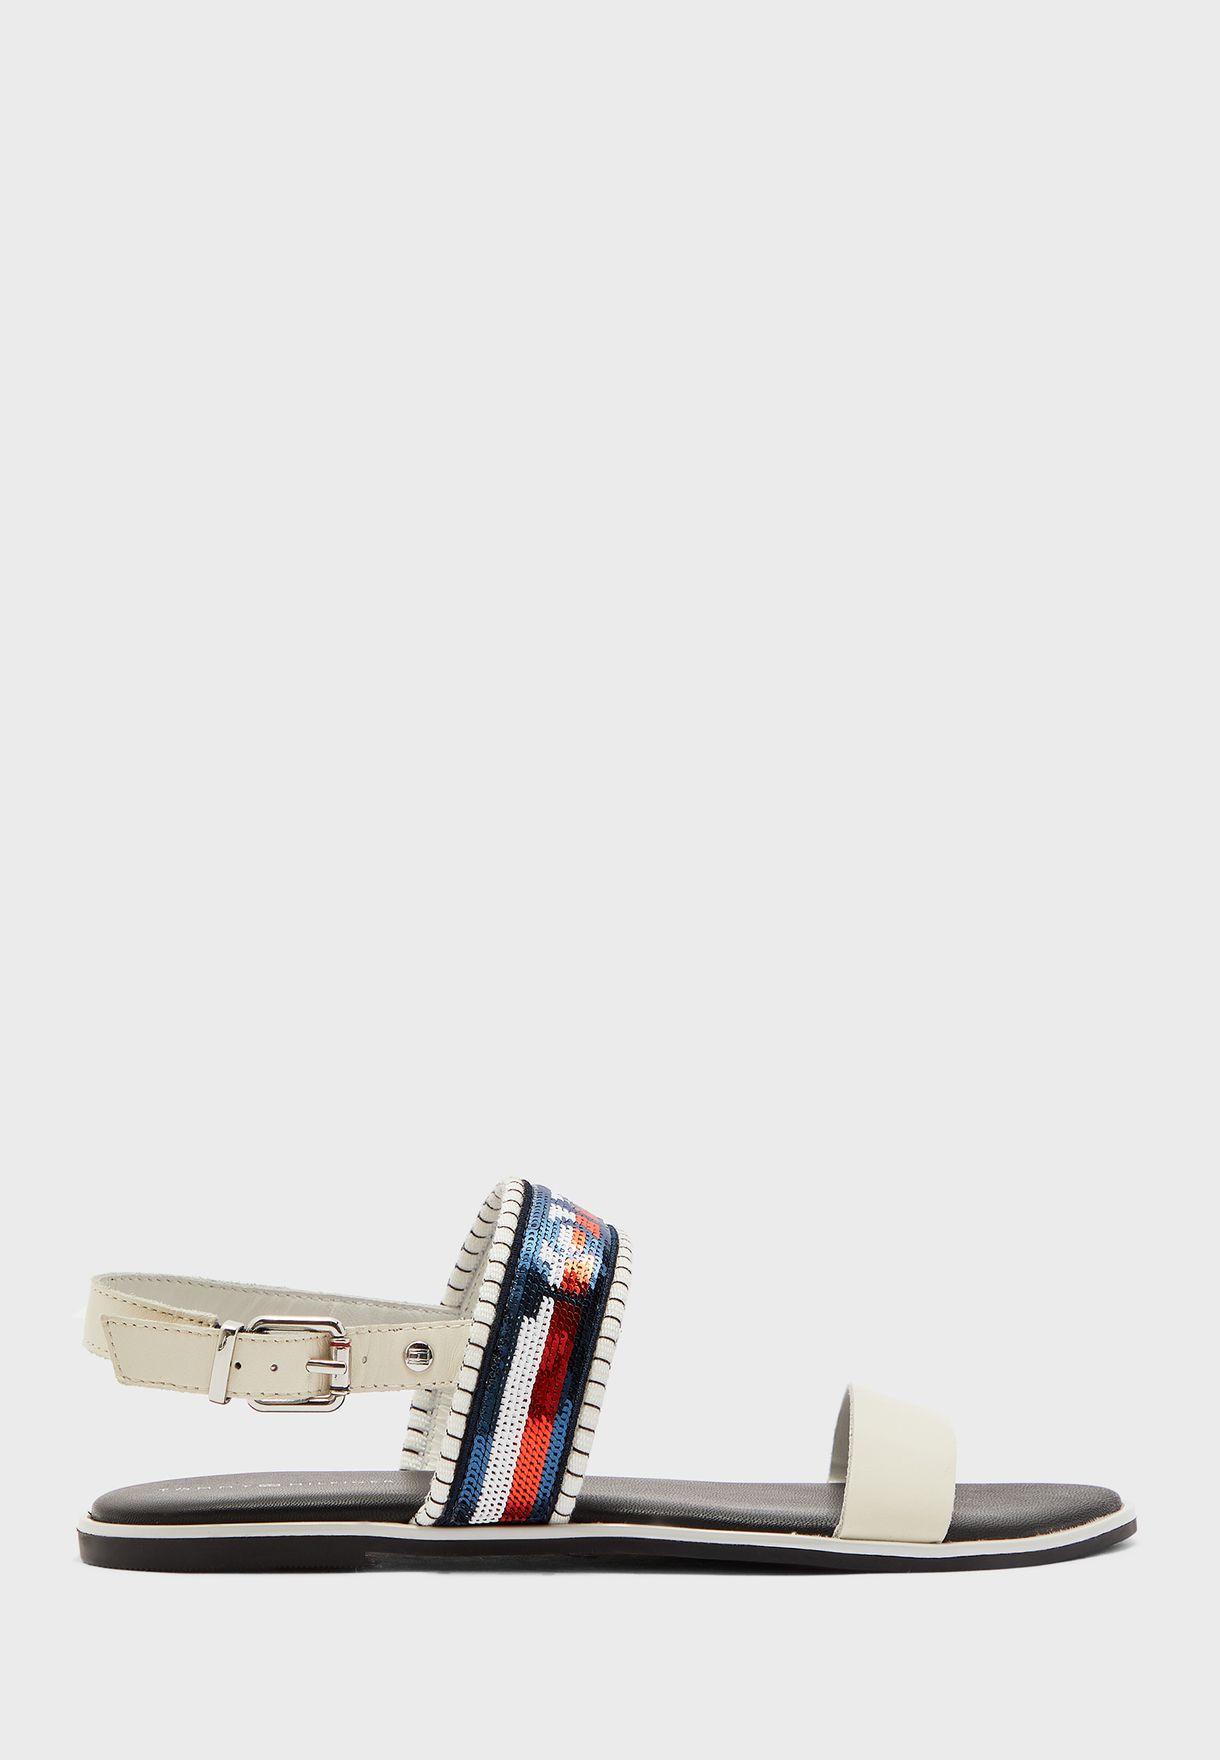 Tommy Sequins Flat Sandal - YBI